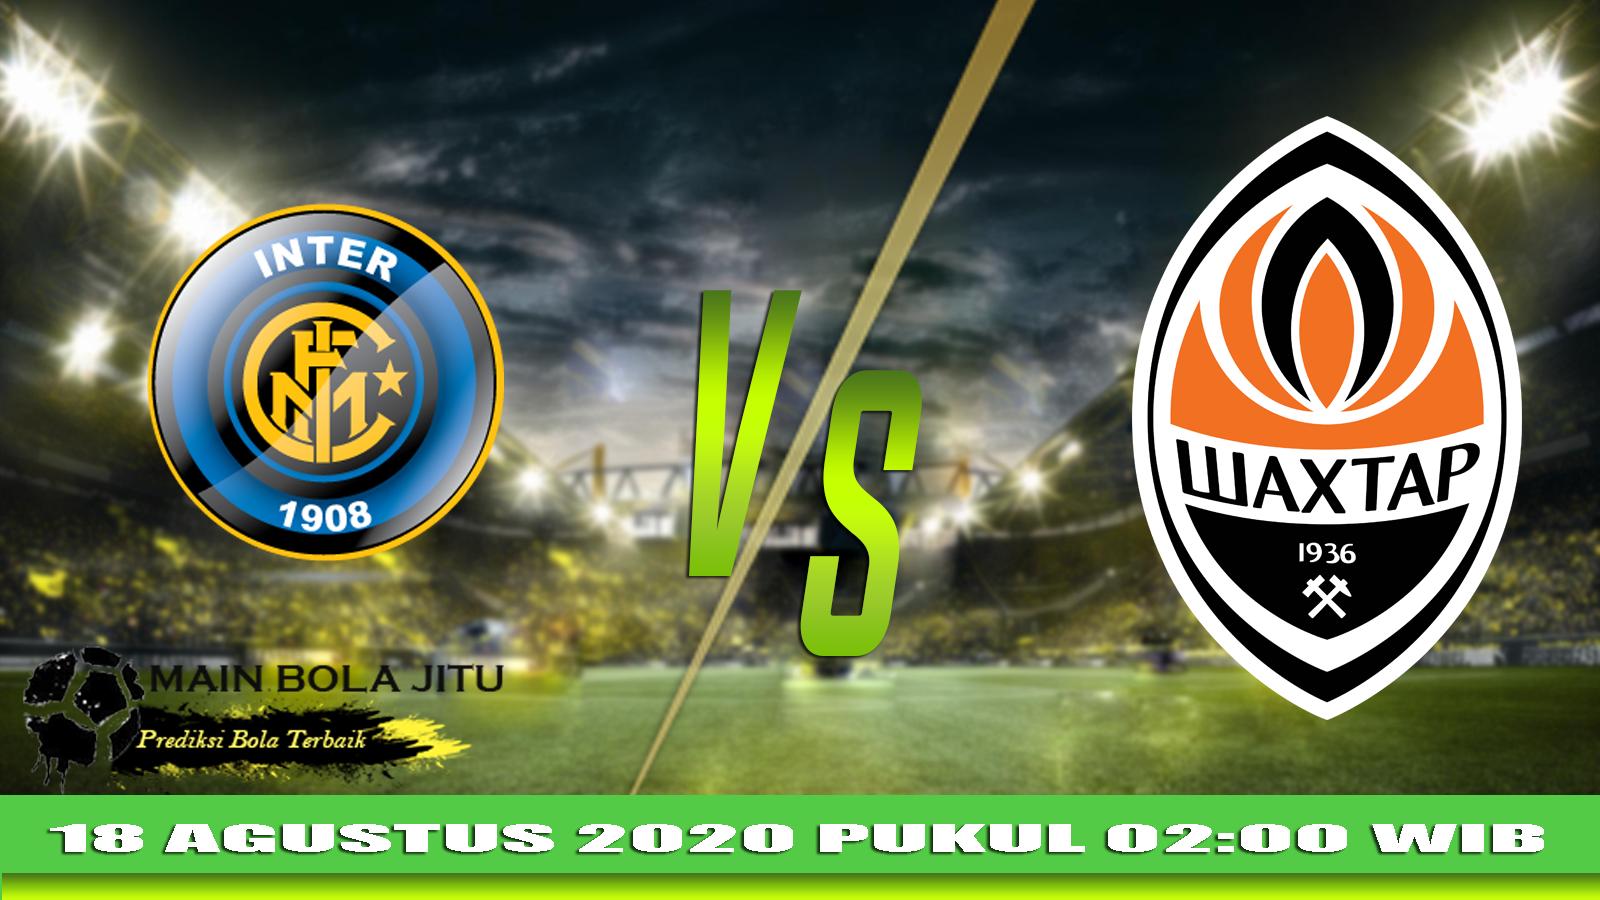 Prediksi Bola Inter Milan Vs Shakhtar Donetsk